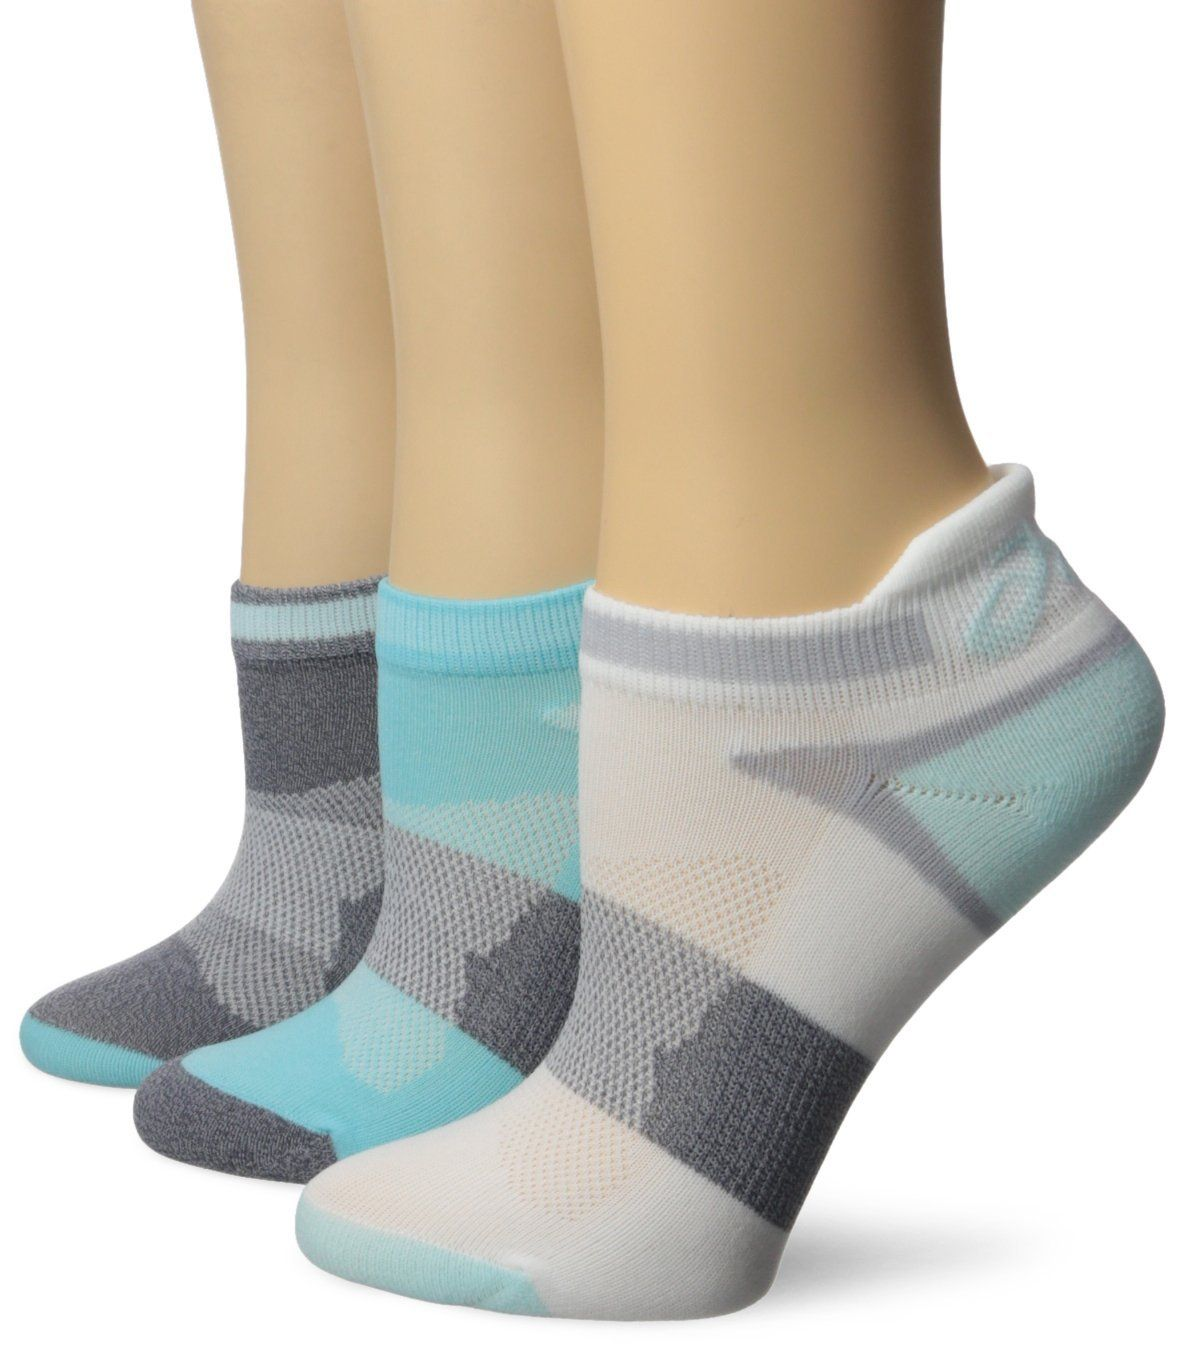 Amazon.com : ASICS Women's Quick Lyte Cushion Single Tab Running ...